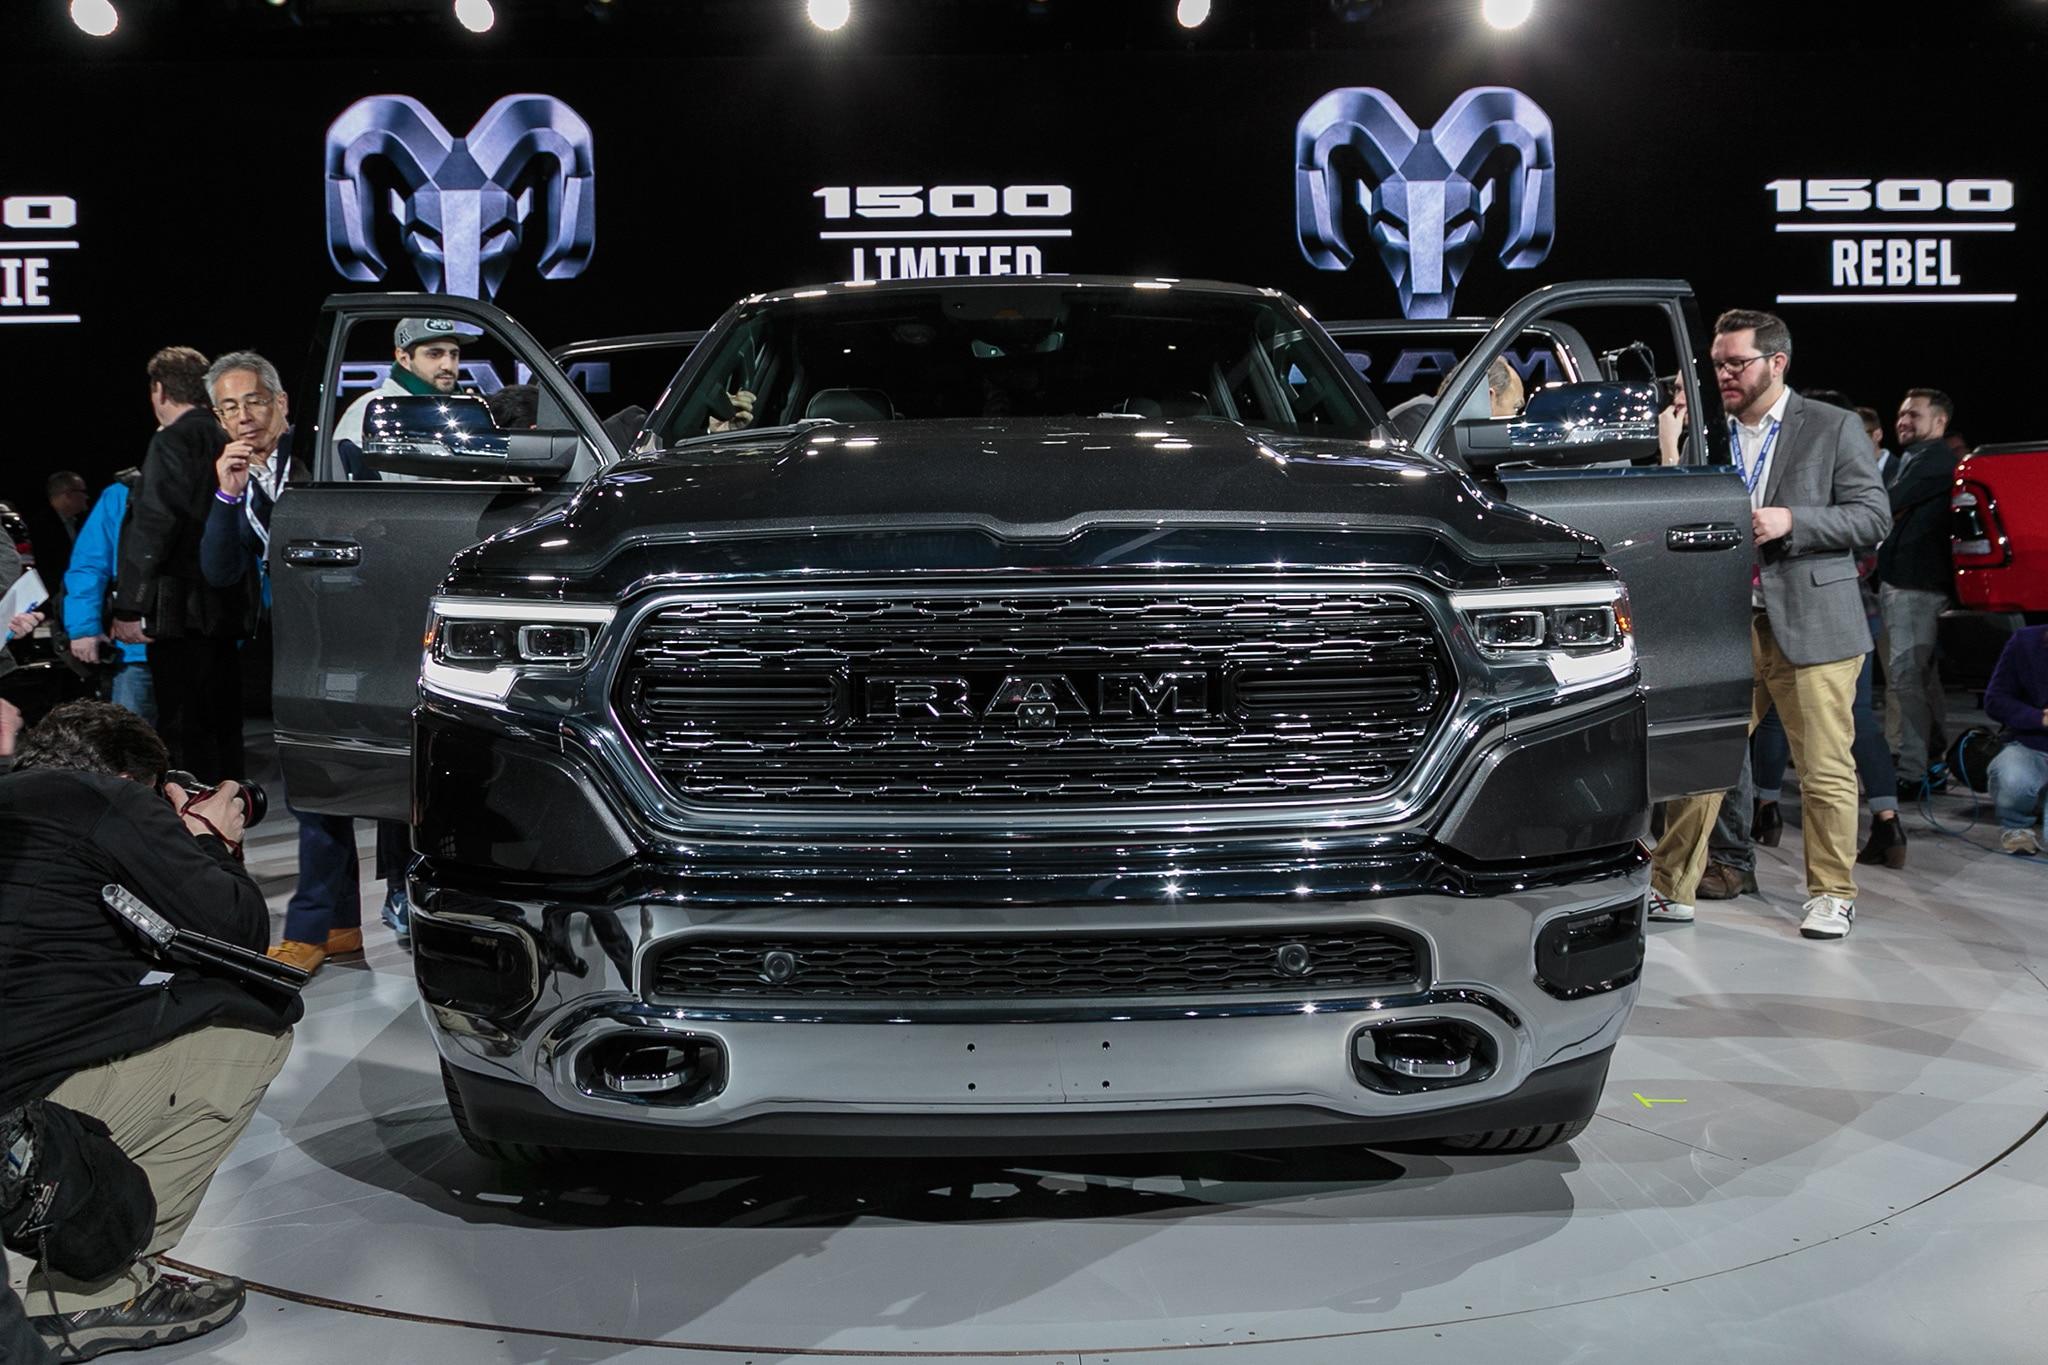 2019 Ram 1500 Limited 10